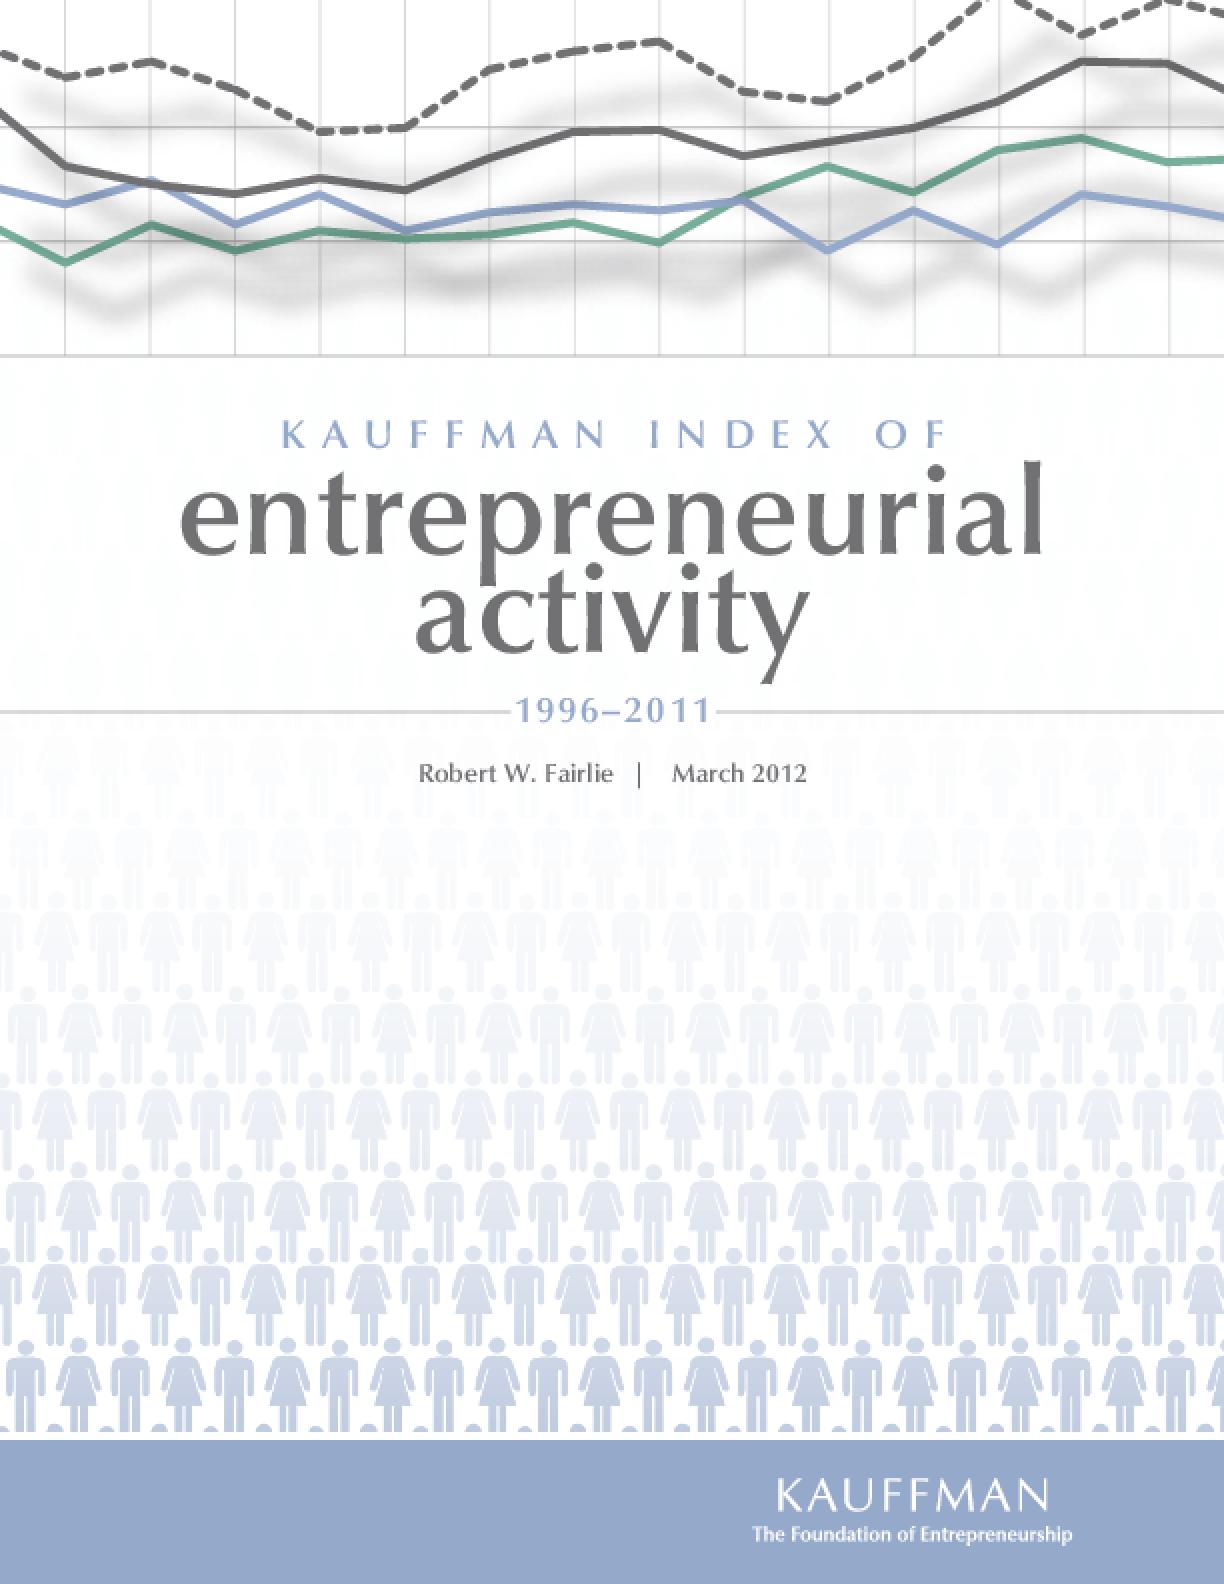 Kauffman Index of Entrepreneurial Activity 1996-2011